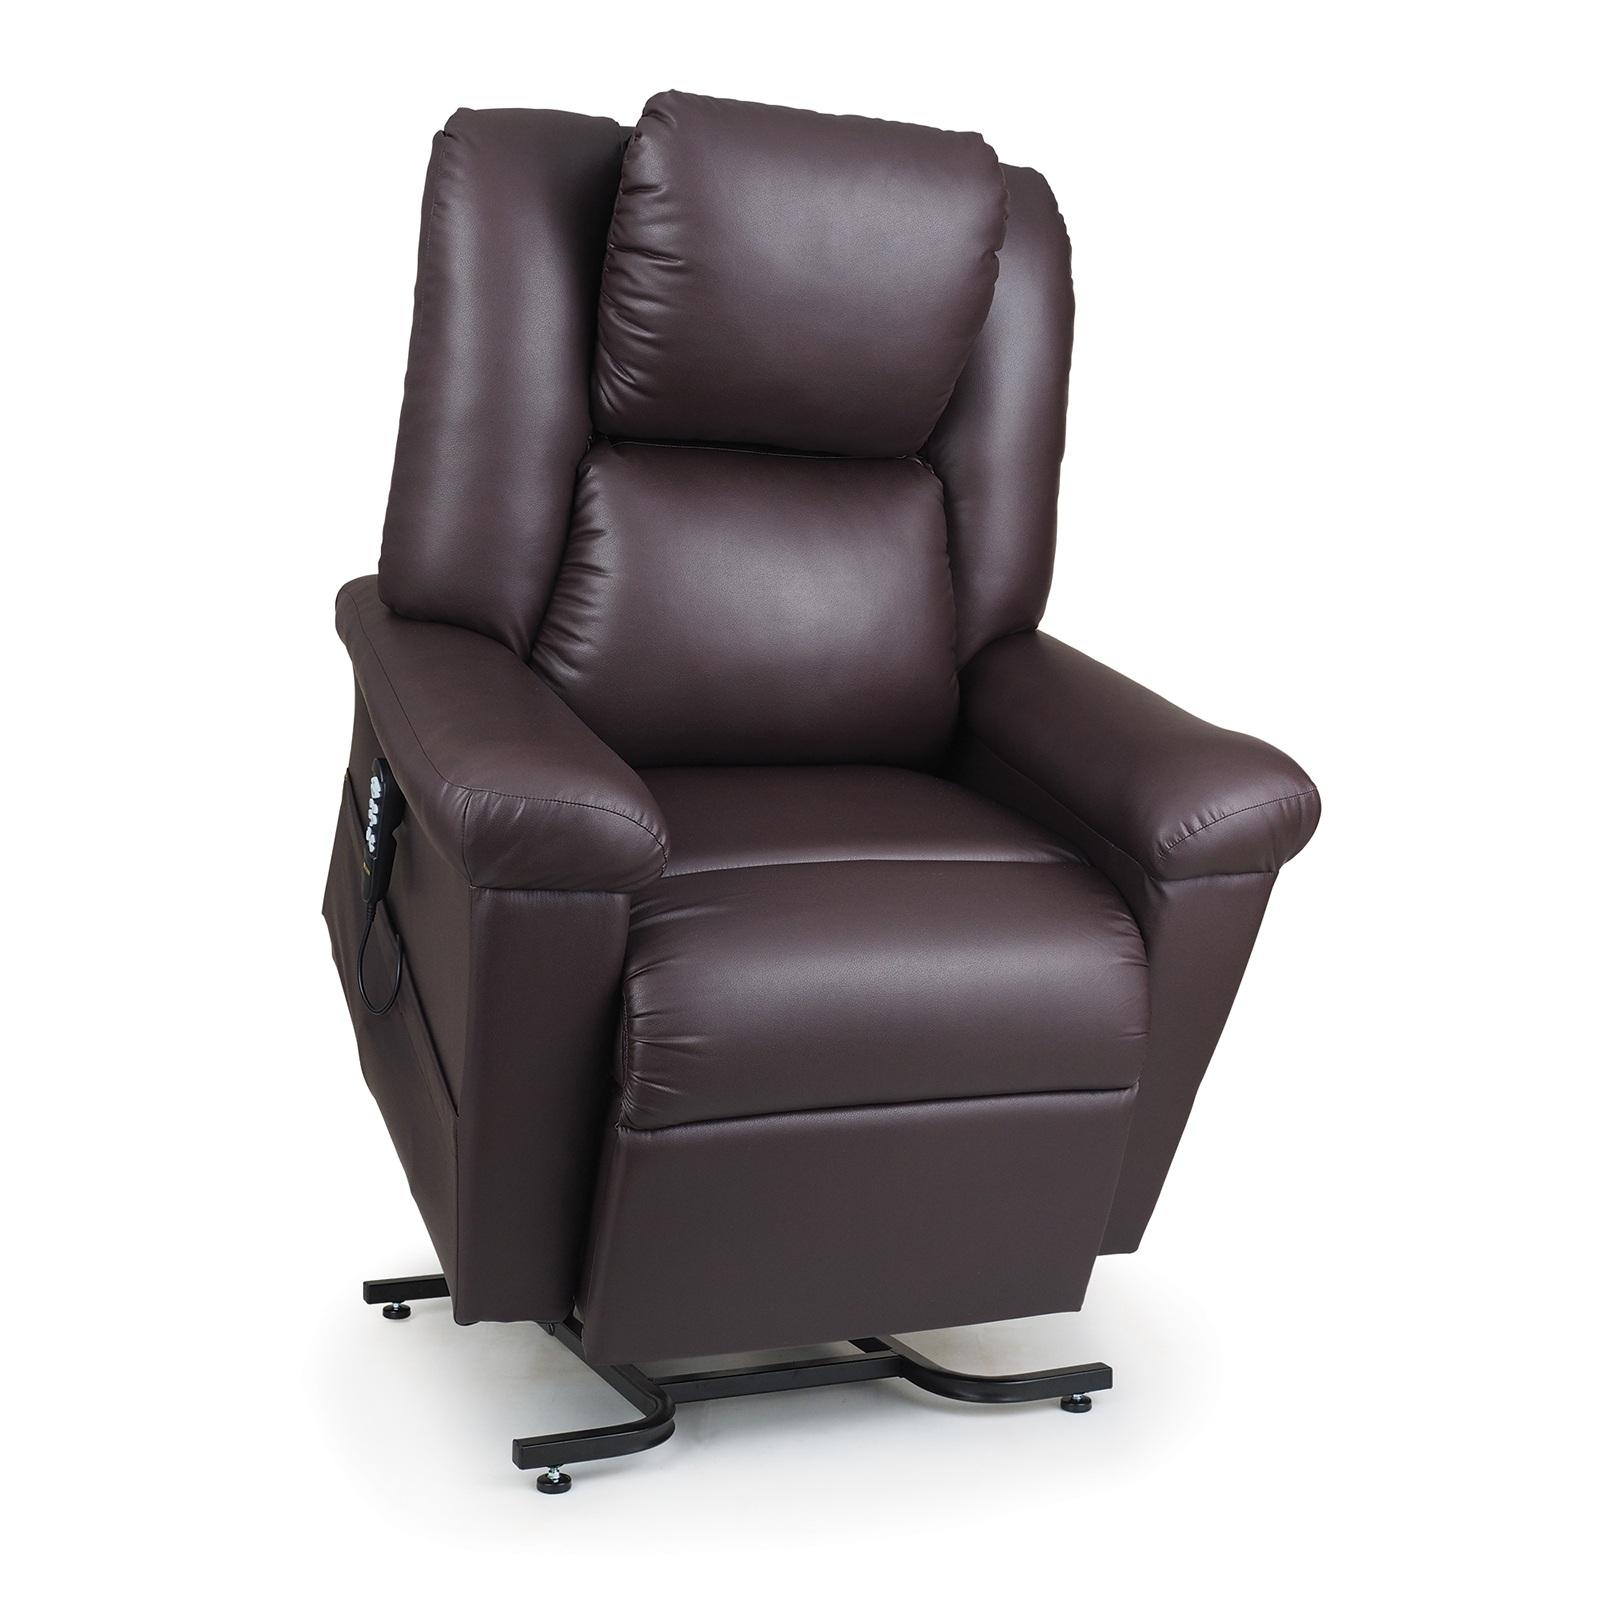 Daydreamer Lift Chair Northeast Mobility